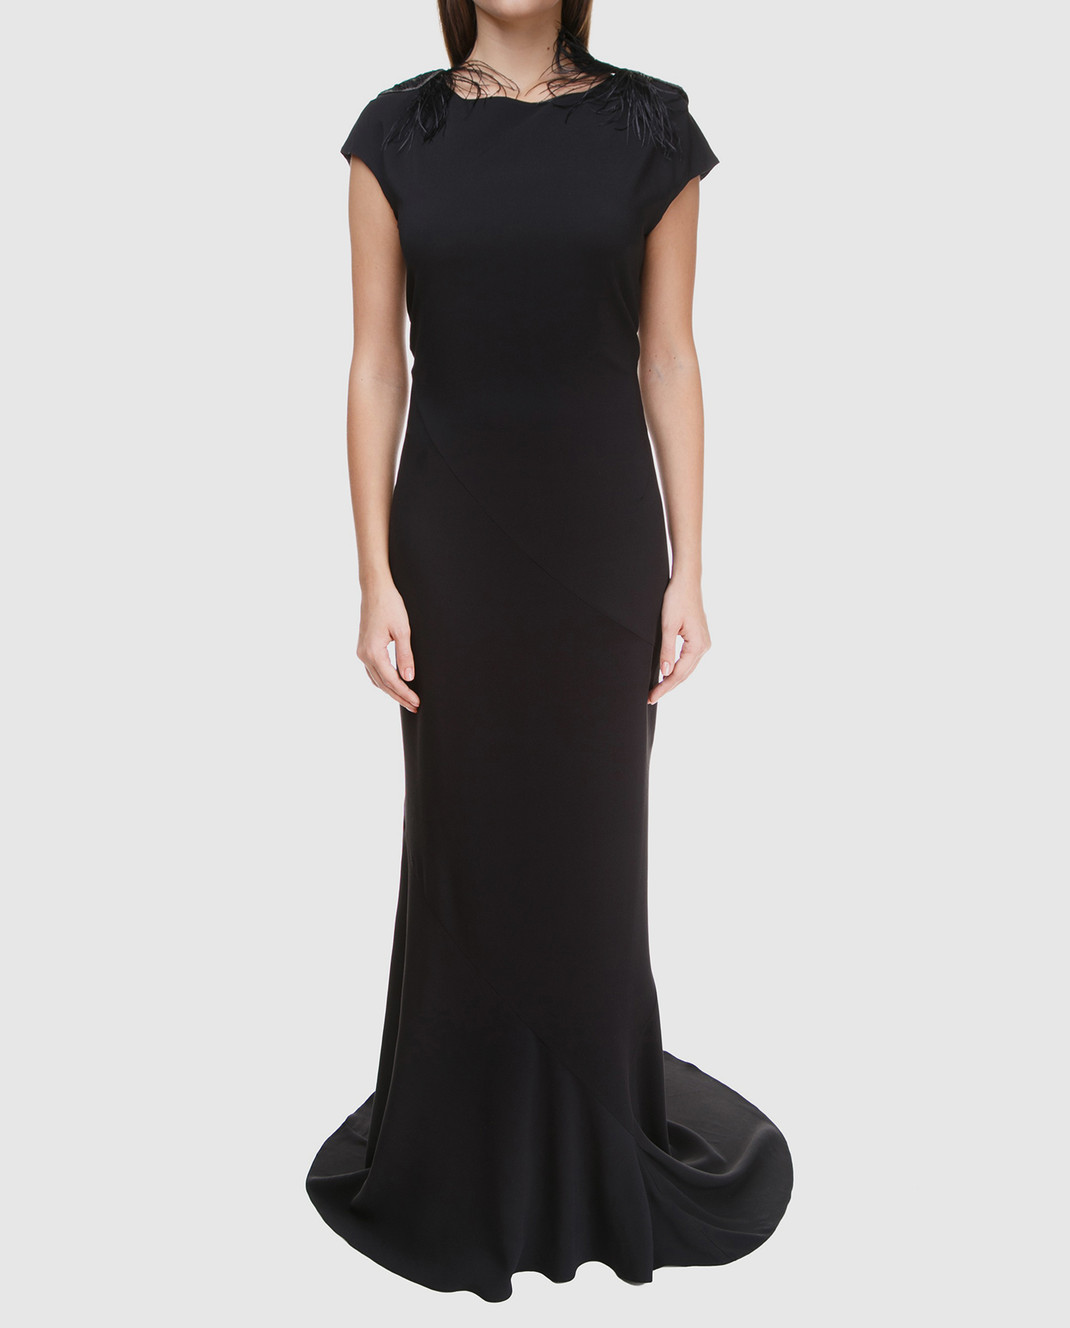 Brunello Cucinelli Черное платье MA970AE661 изображение 2